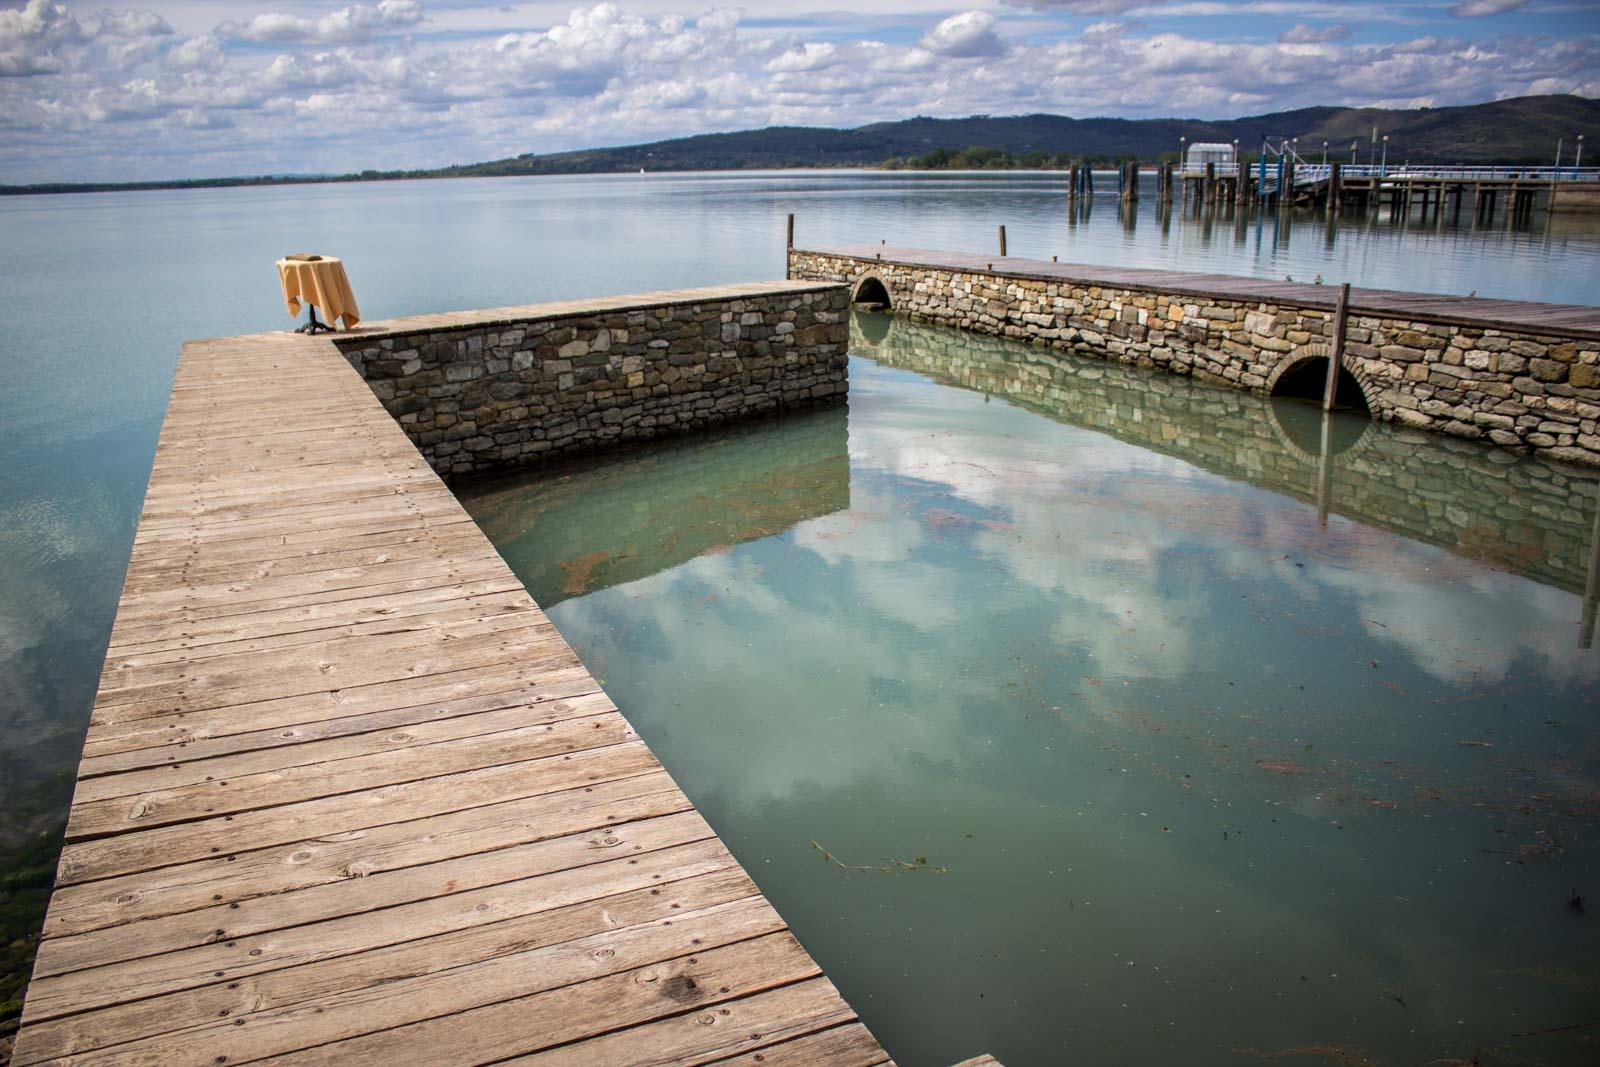 lake trasimeno, isola maggiore, hannibal victory, roman history, umbria